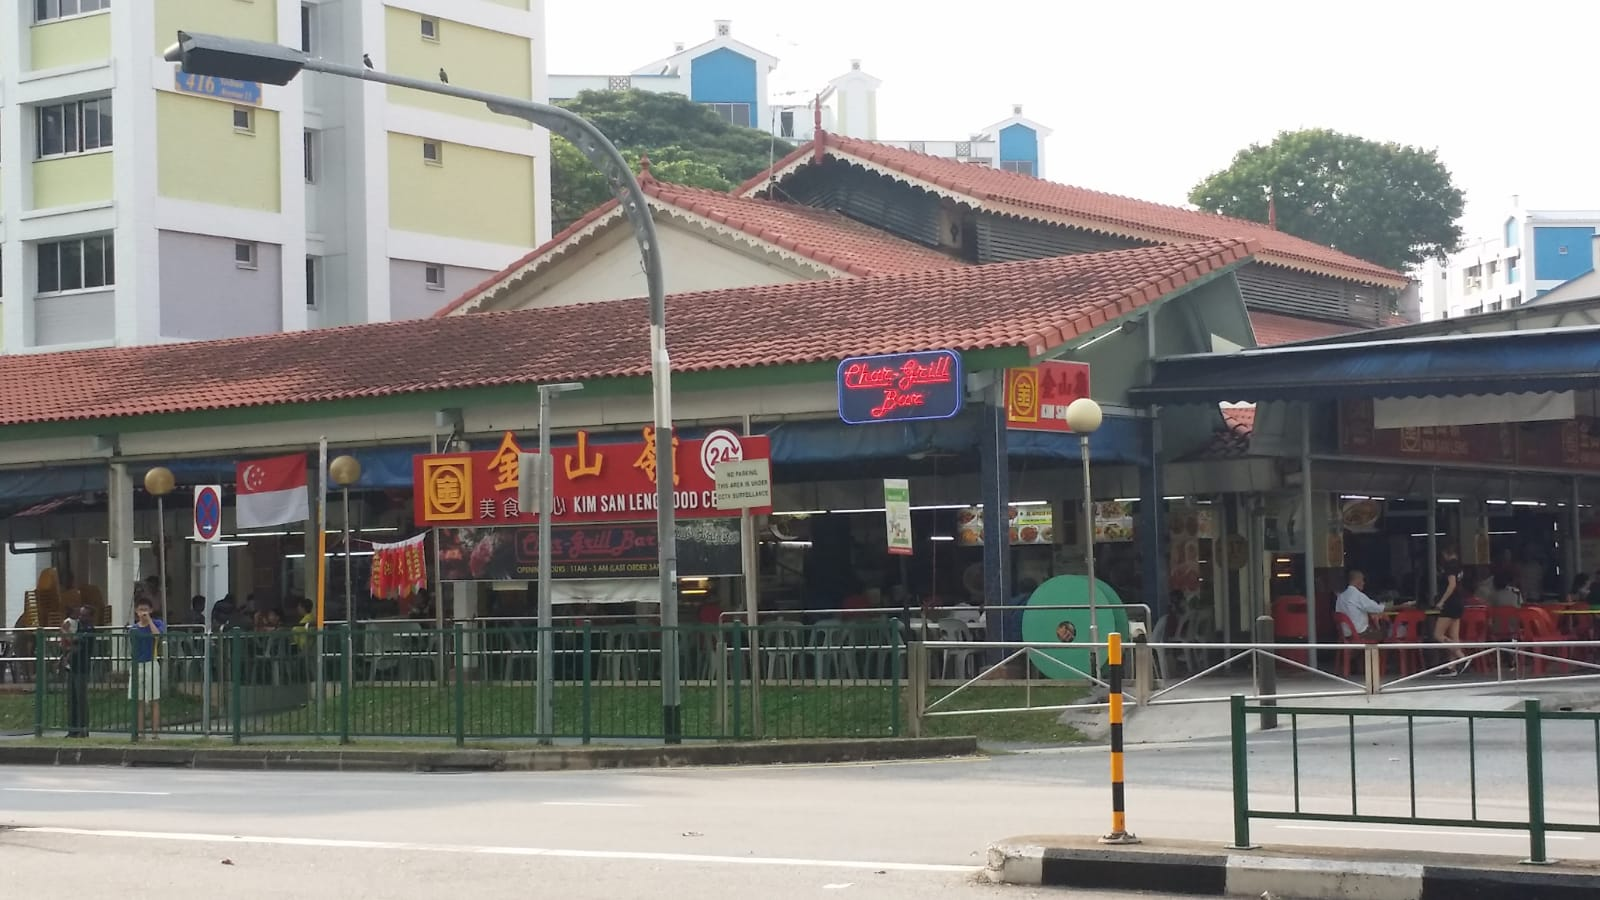 Kim San Leng Food Centre Yishun